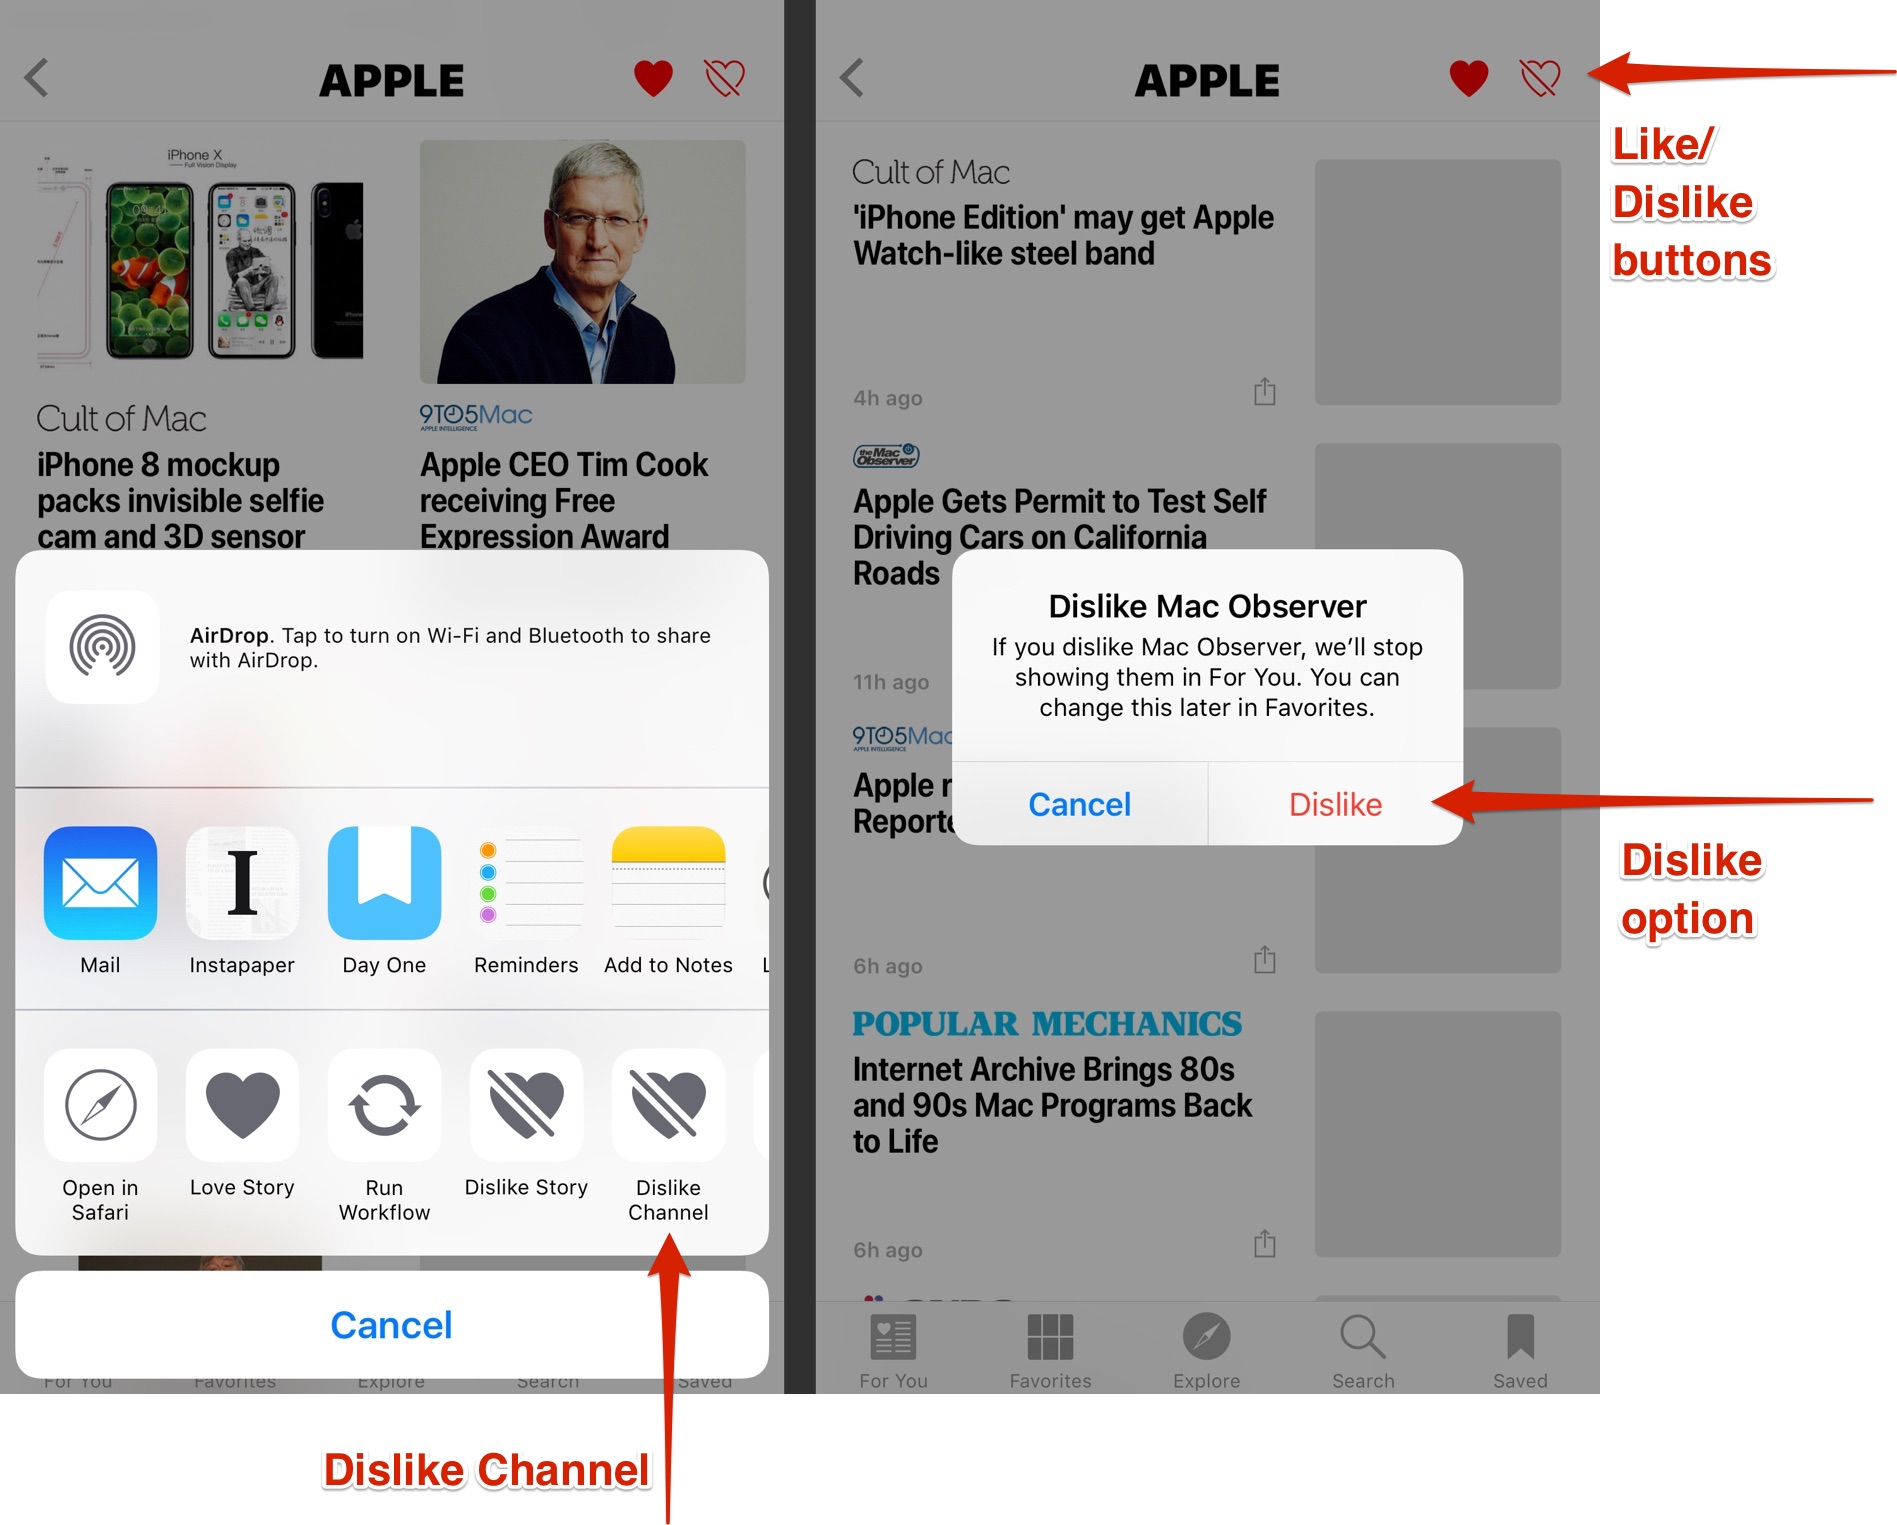 Steps to dislike a news source in Apple News